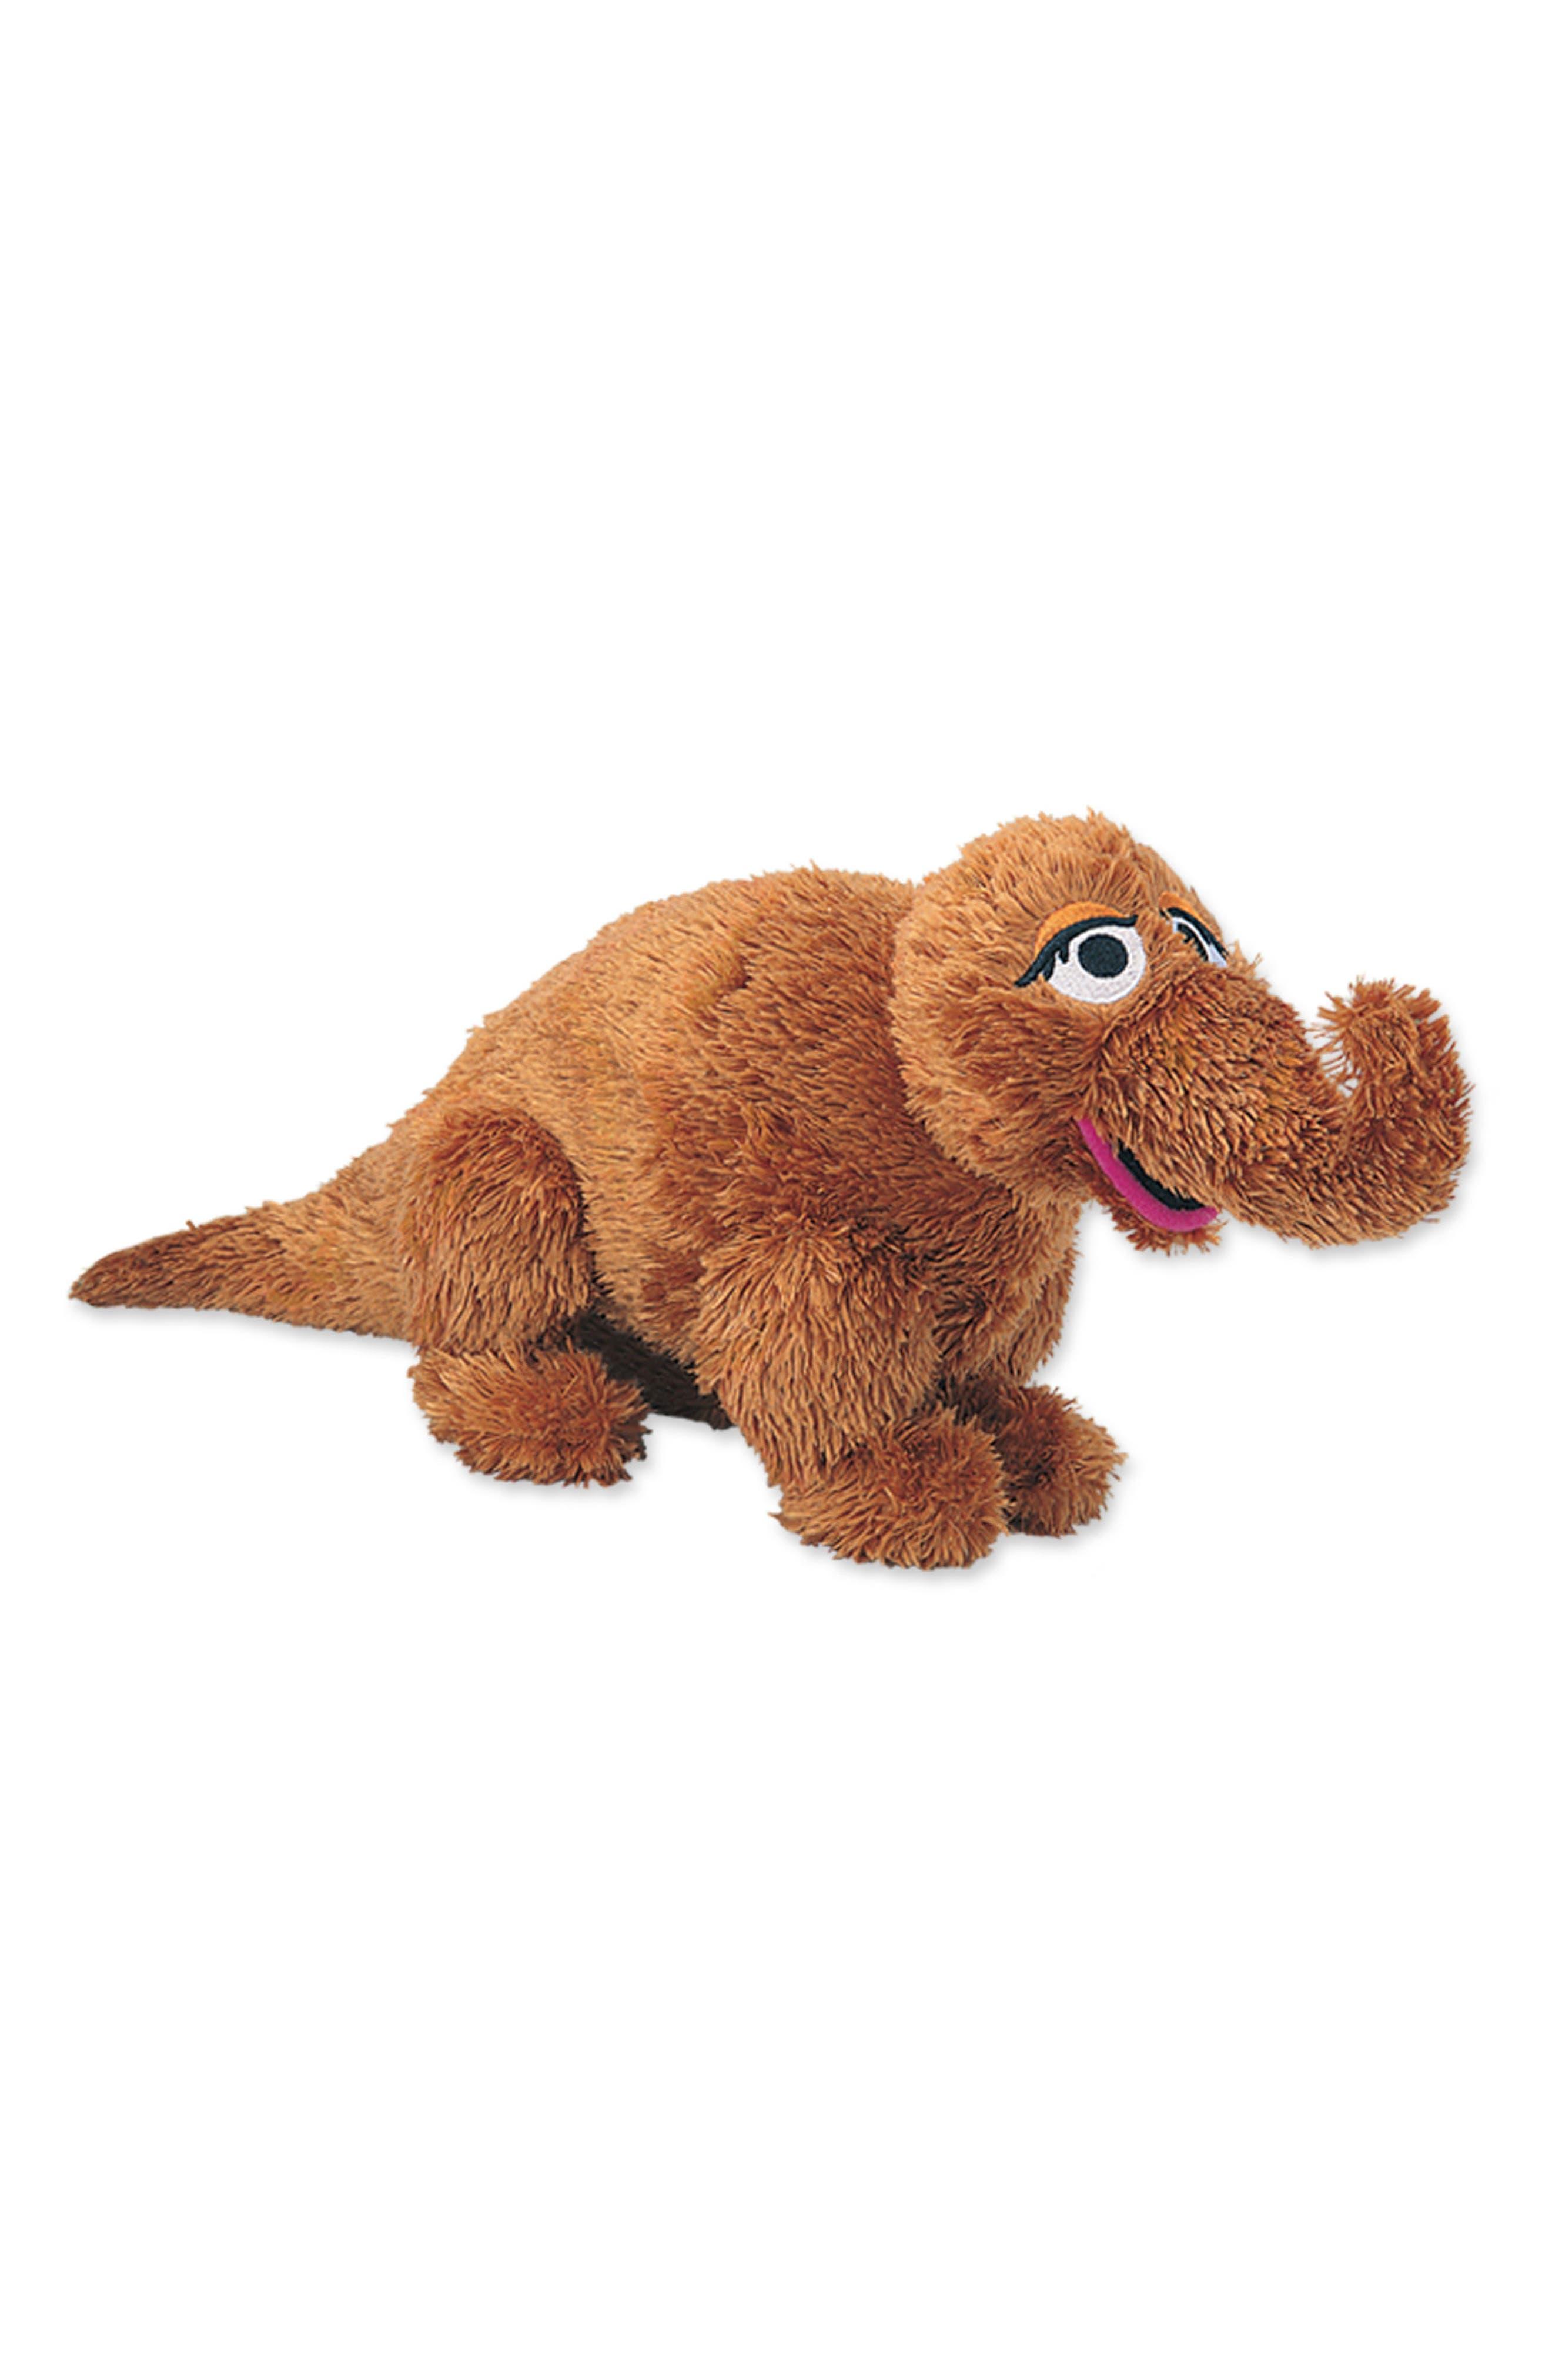 'Snuffleupagus' Stuffed Toy,                         Main,                         color, Brown